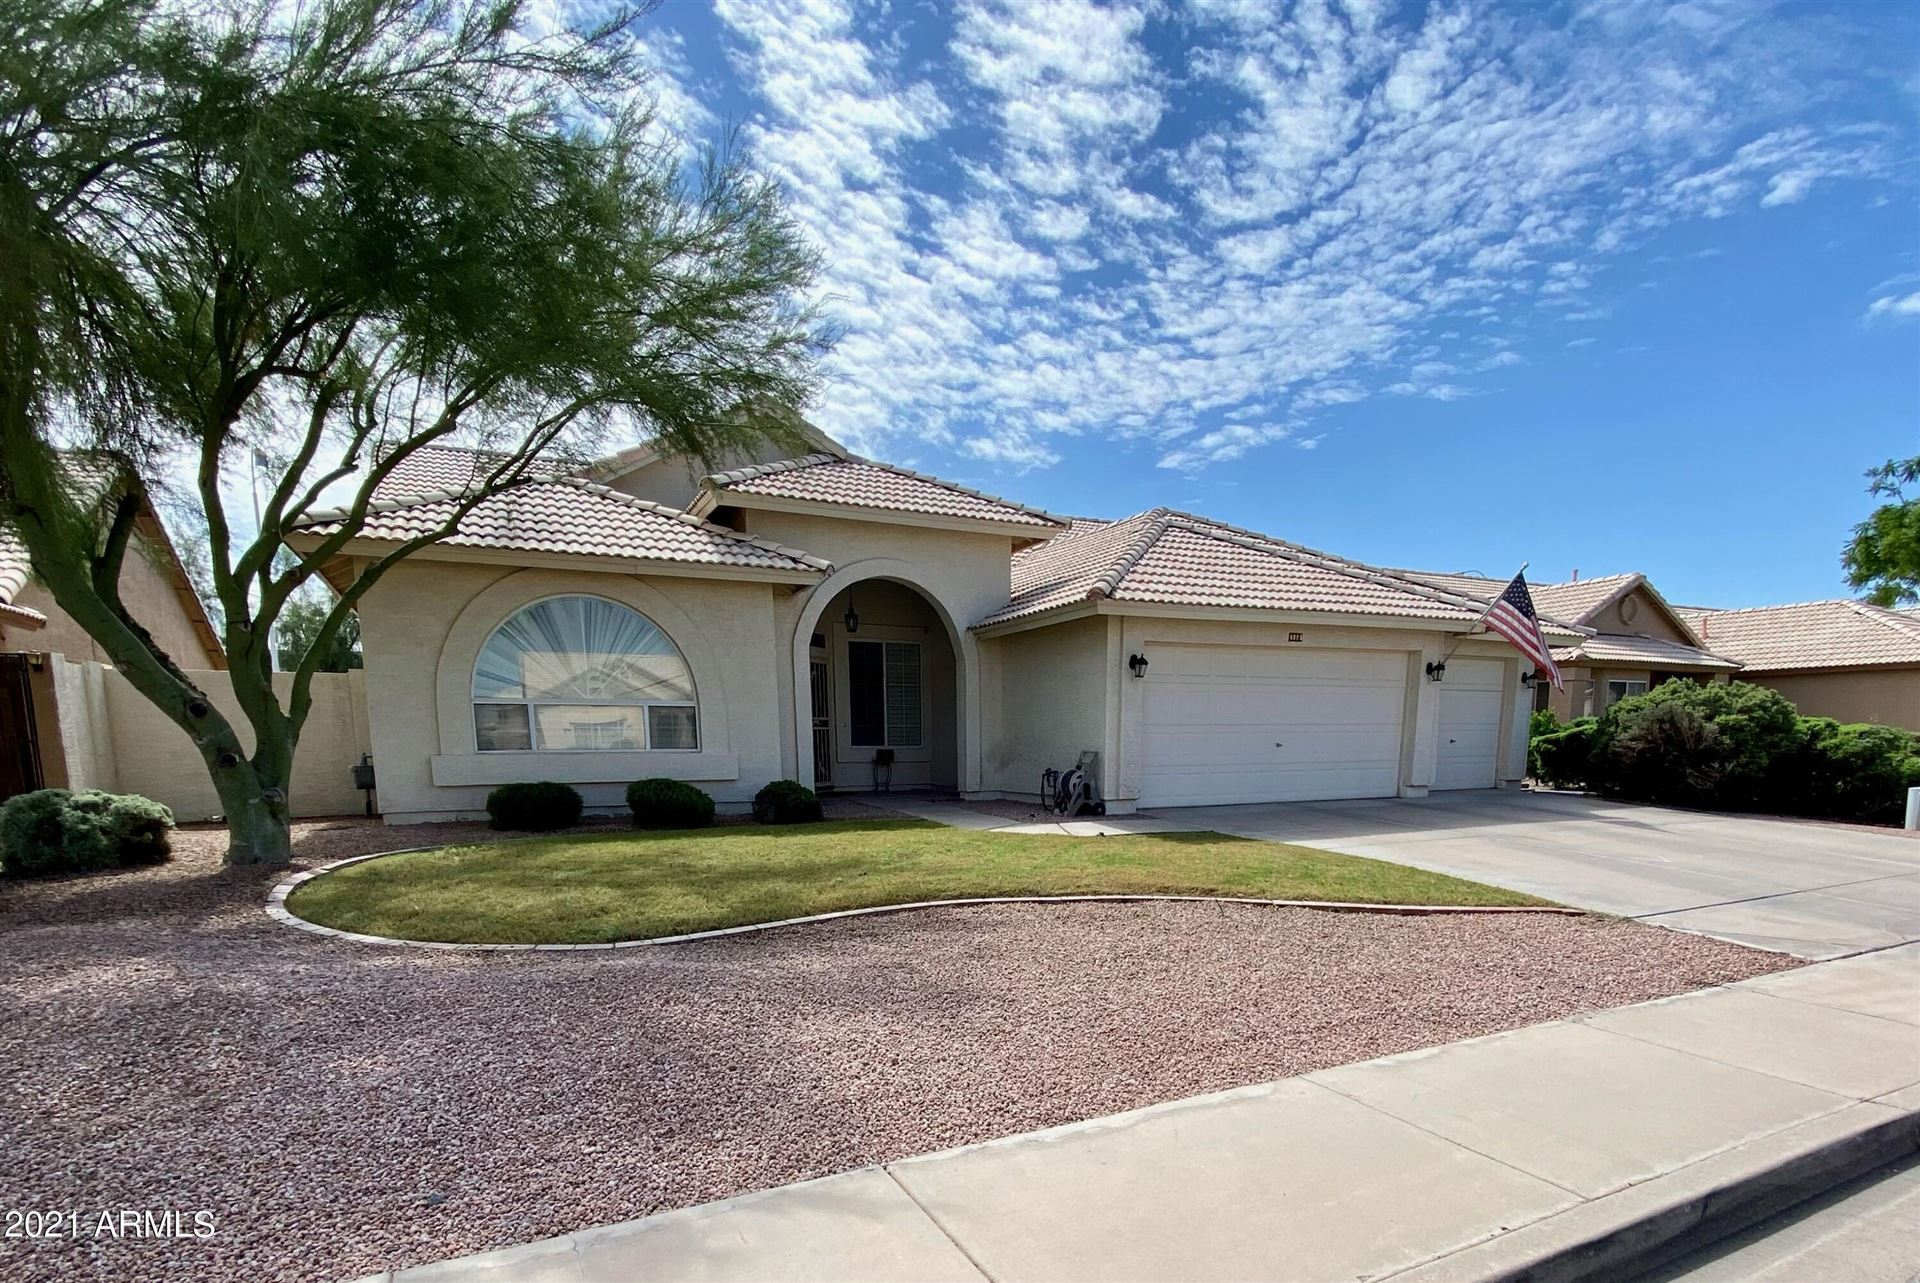 Photo of 4085 W LAREDO Street, Chandler, AZ 85226 (MLS # 6299662)